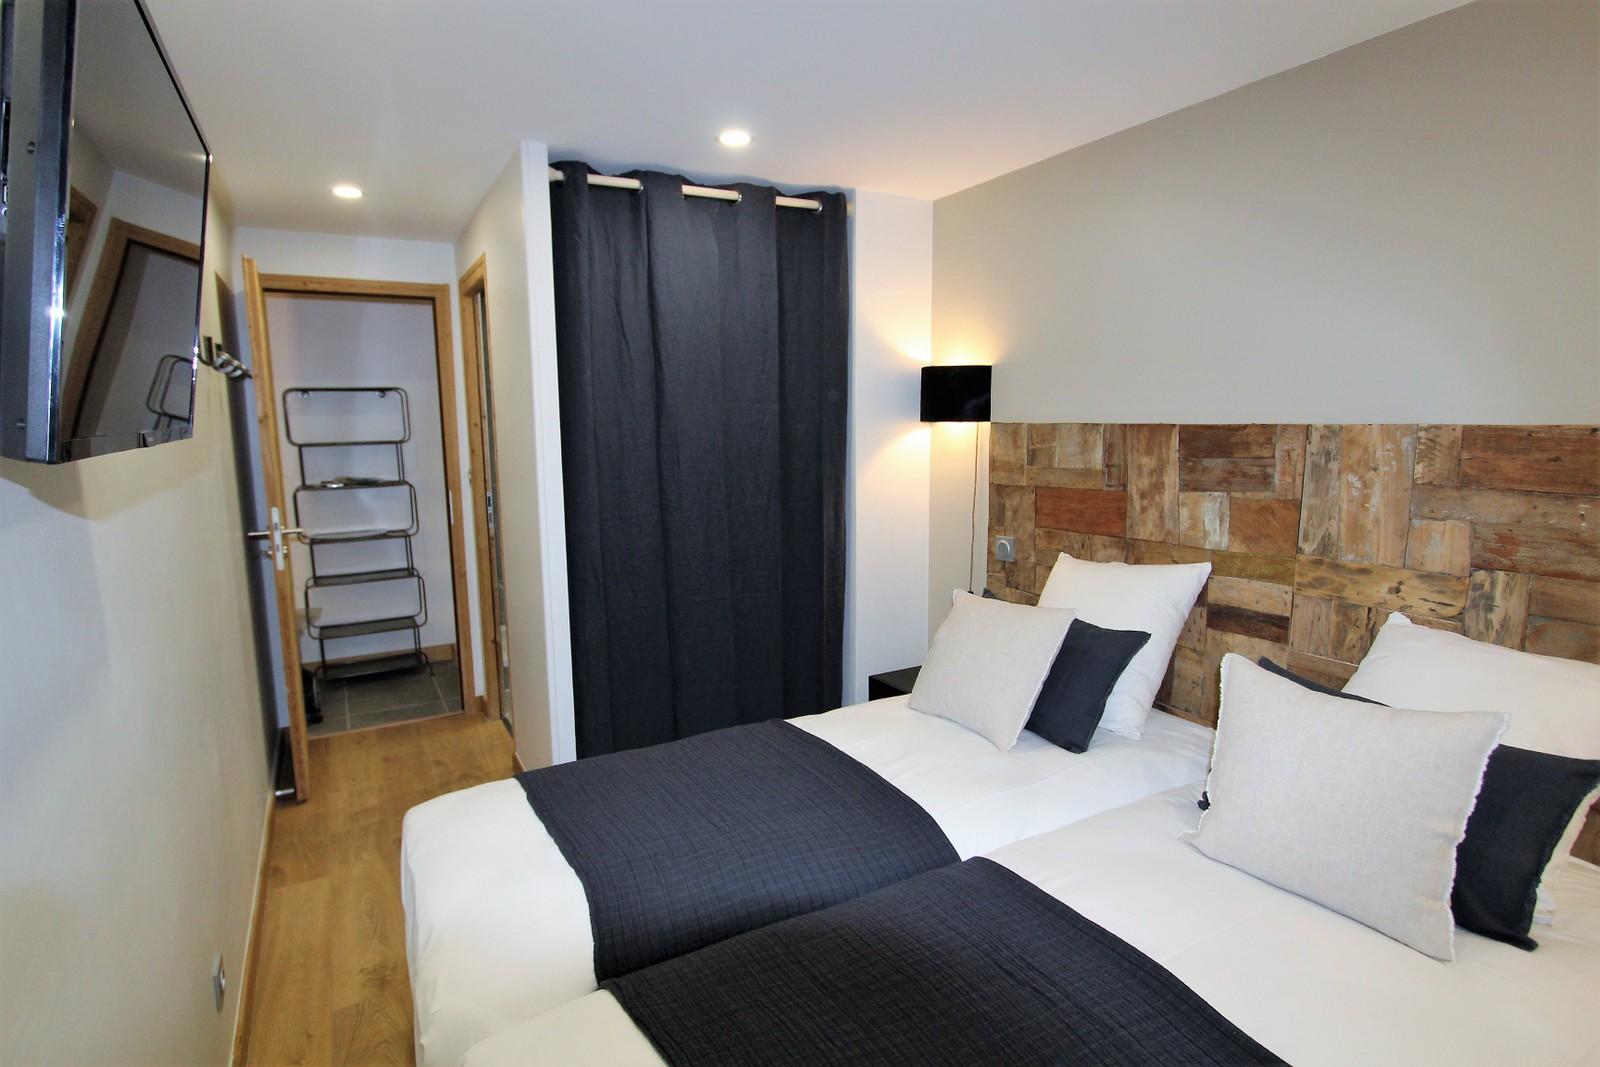 Chambre confort salle de bain individuelle ski chacun sa chambre chacun sa salle de bain cosy